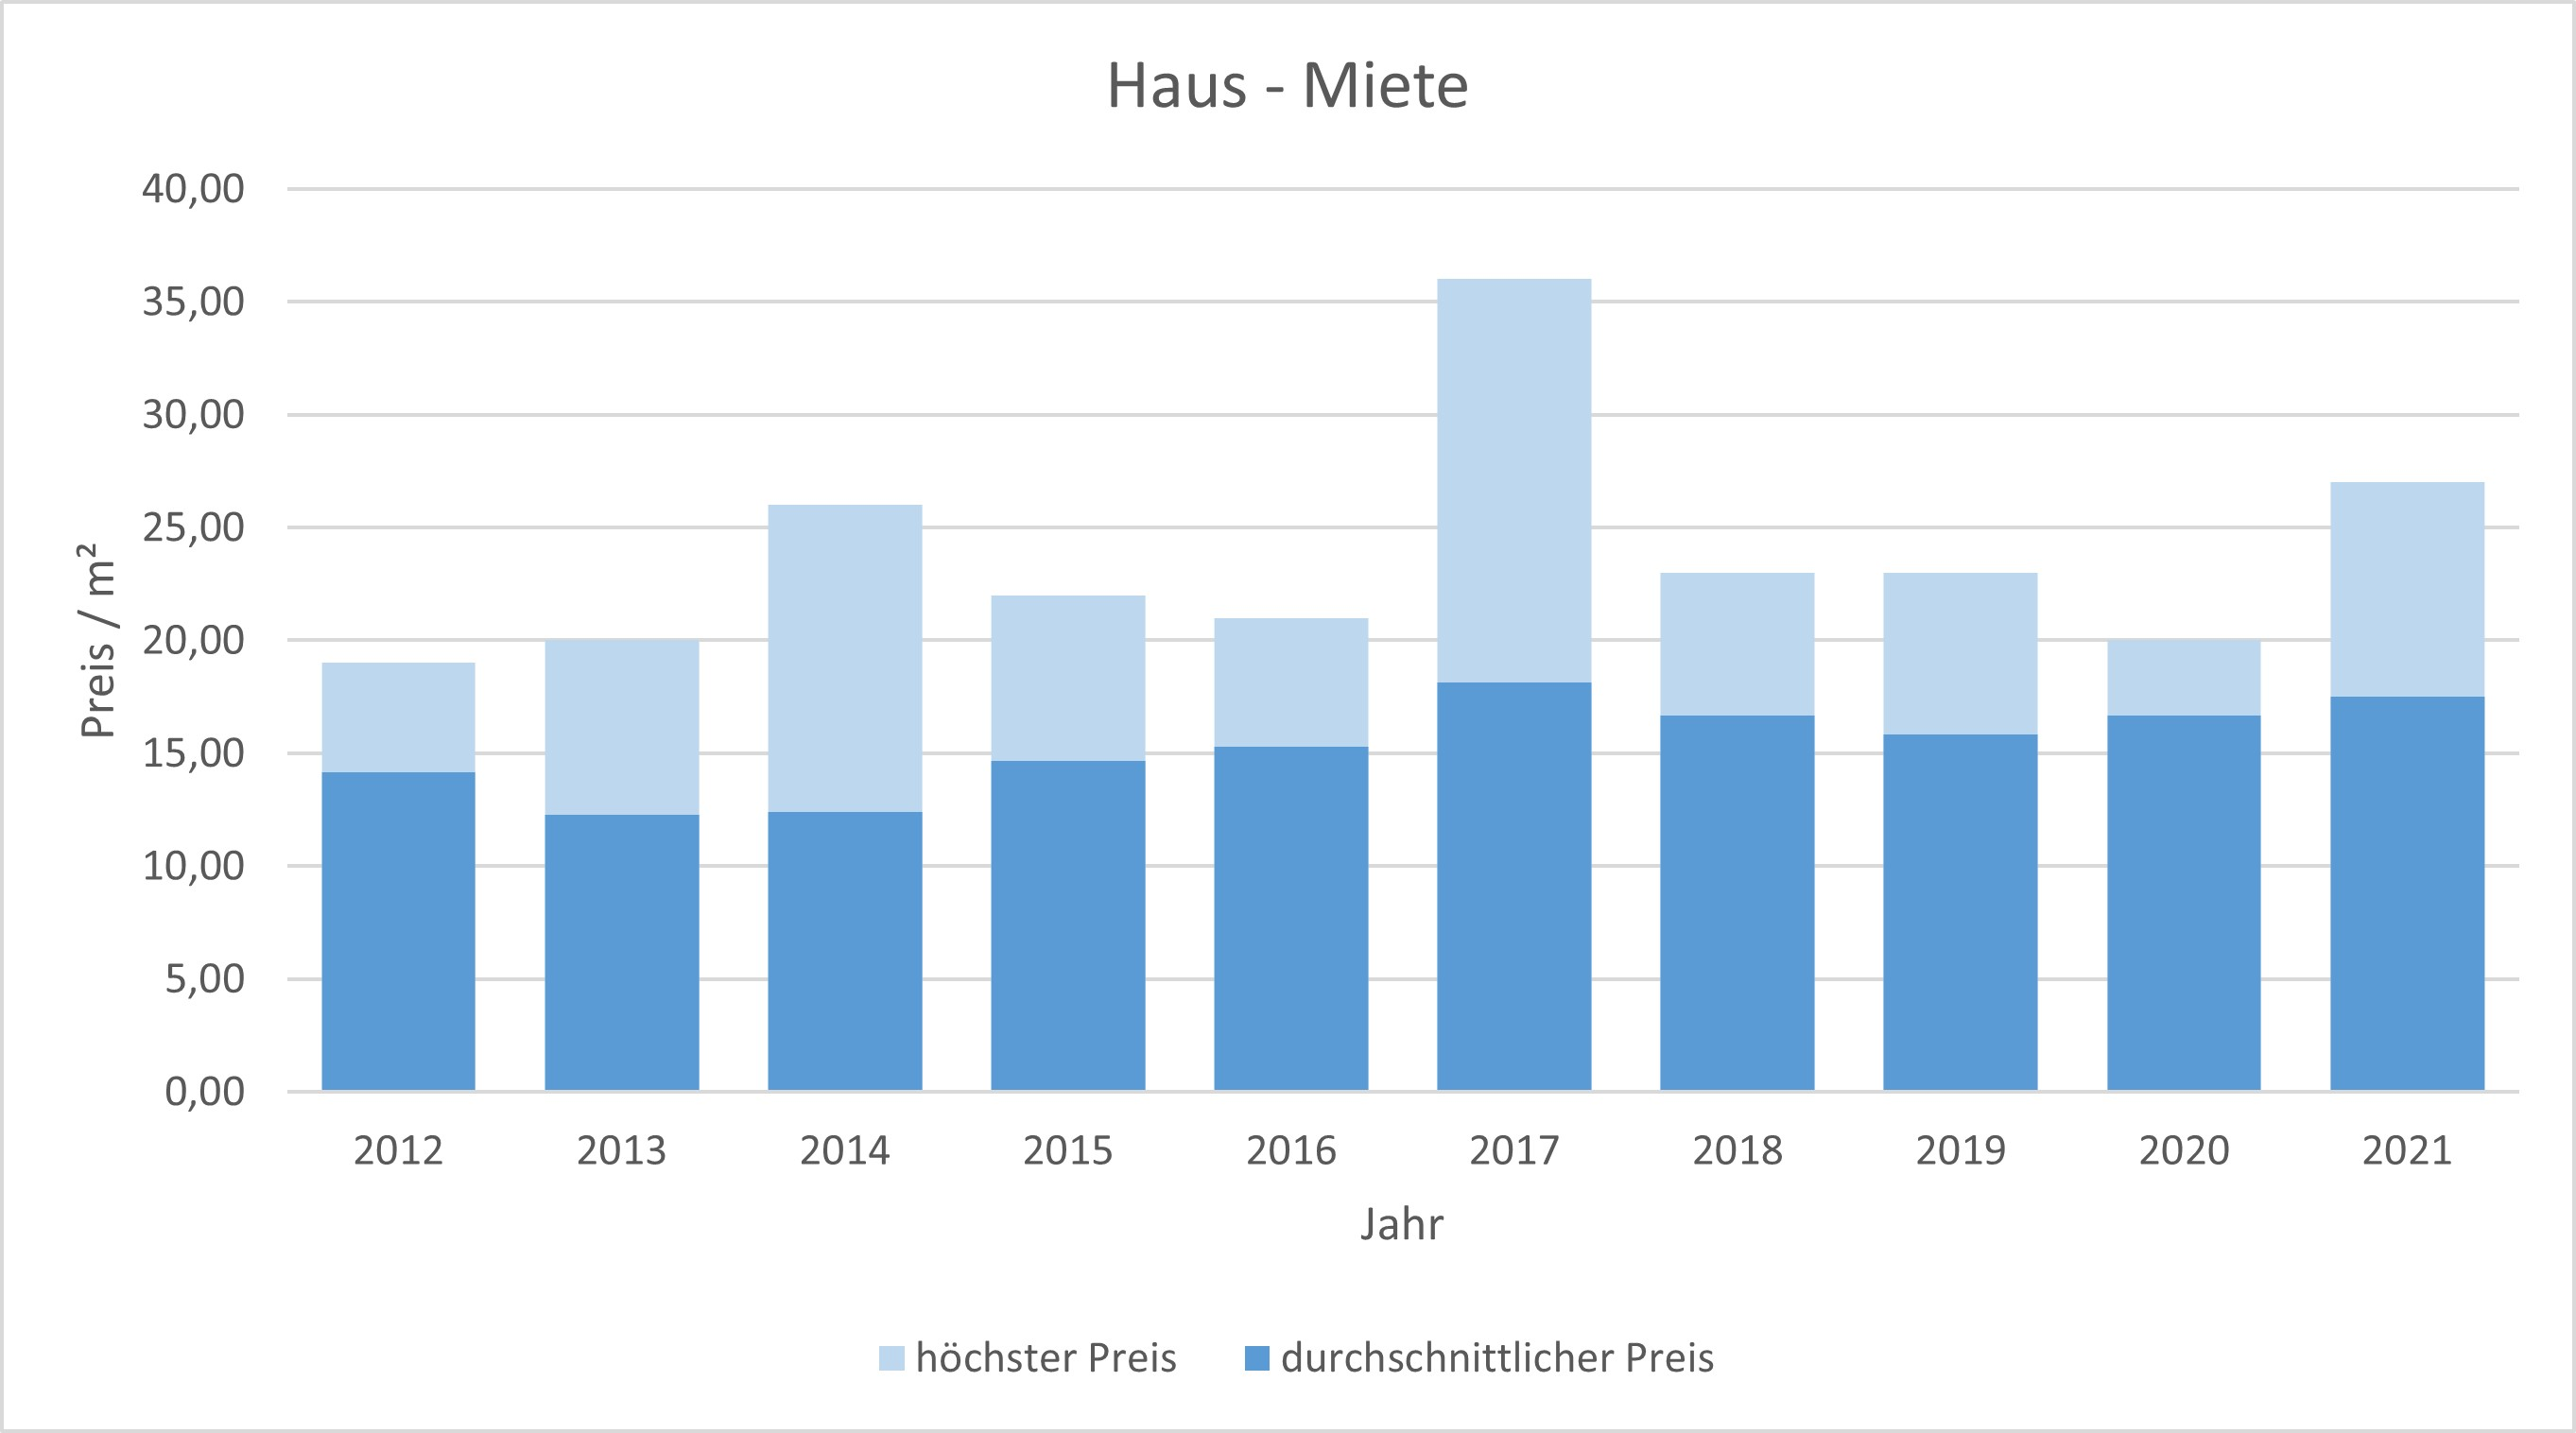 München - Moosach Haus mieten vermieten Preis Bewertung Makler www.happy-immo.de 2019 2020 2021